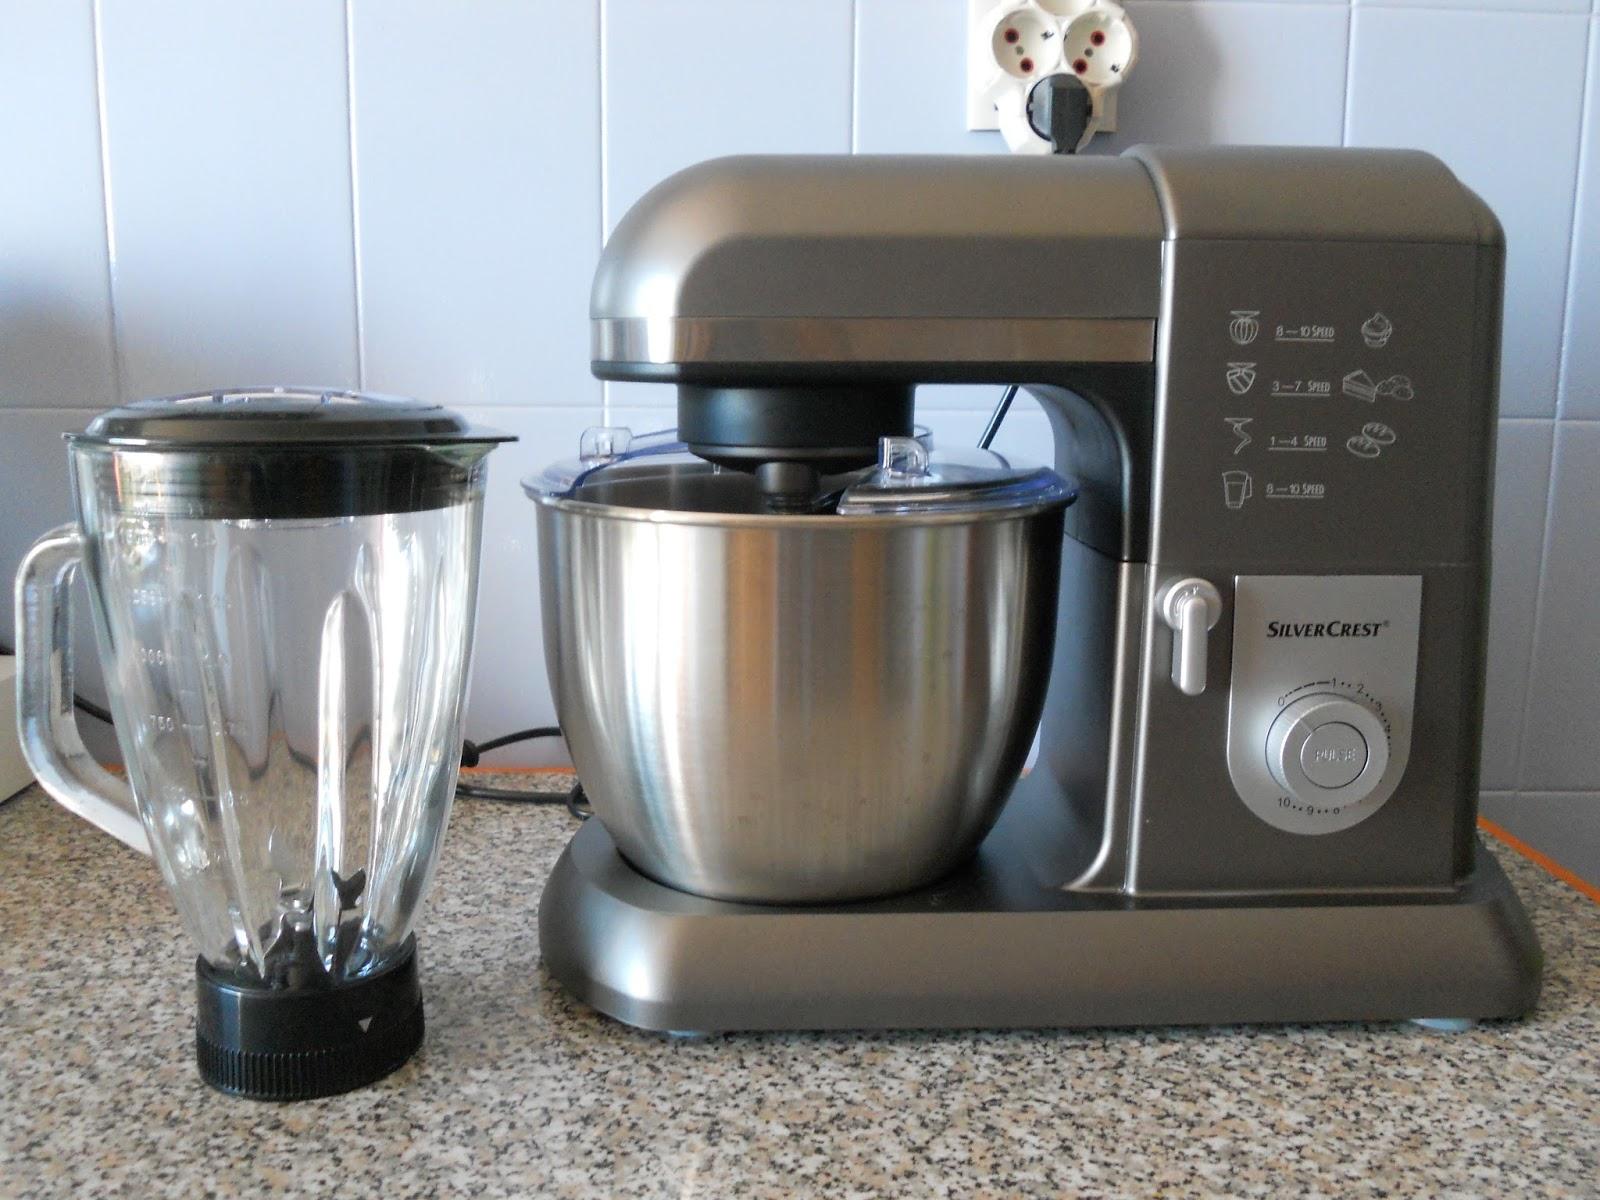 New in robot de cozinha silvercrest for Robot cocina lidl silvercrest